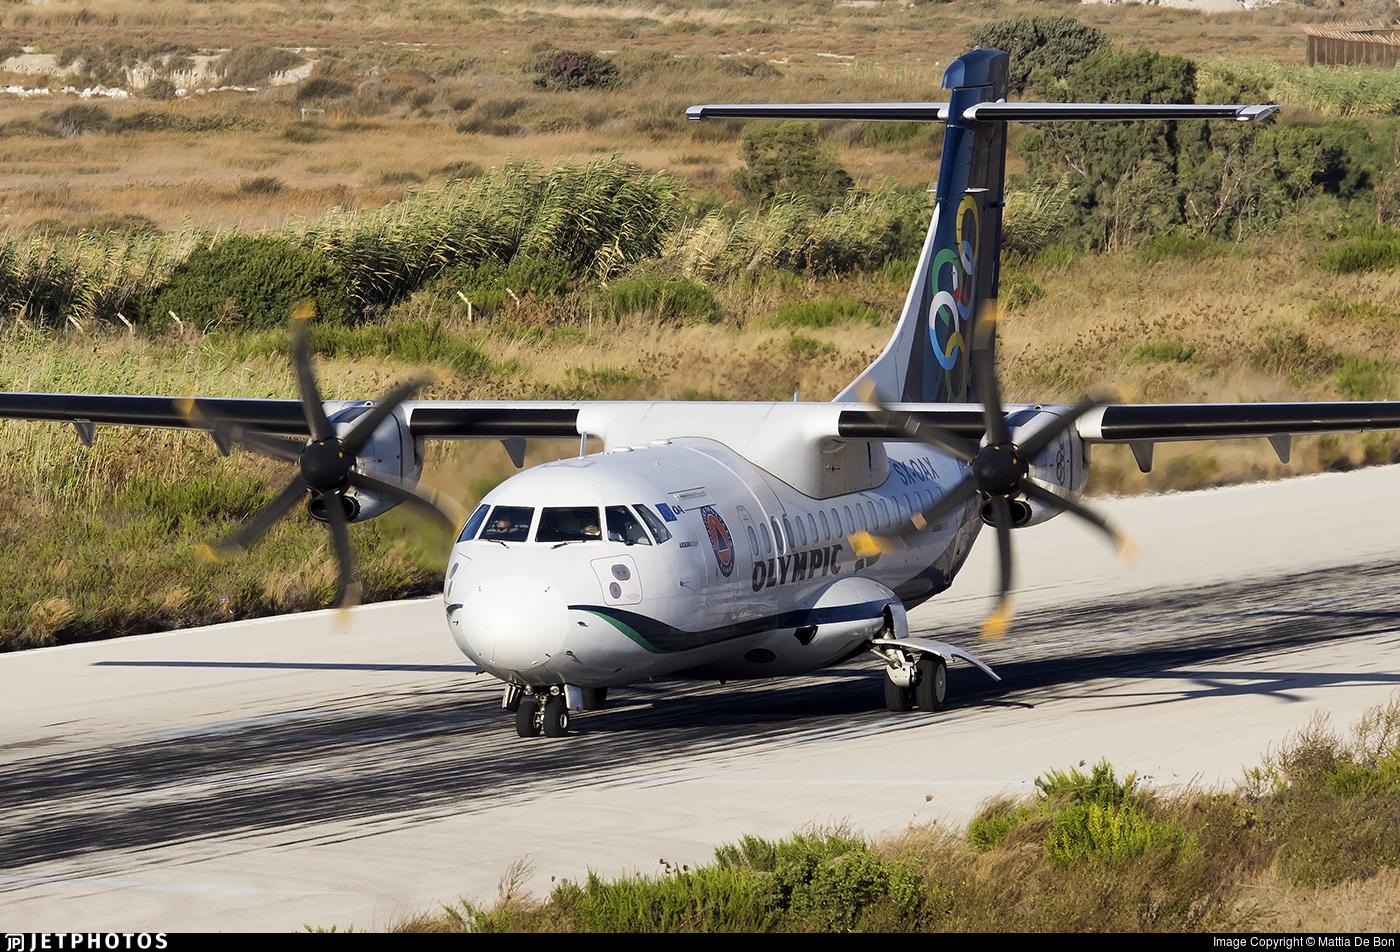 SX-OAX - ATR 42-600 - Olympic Air